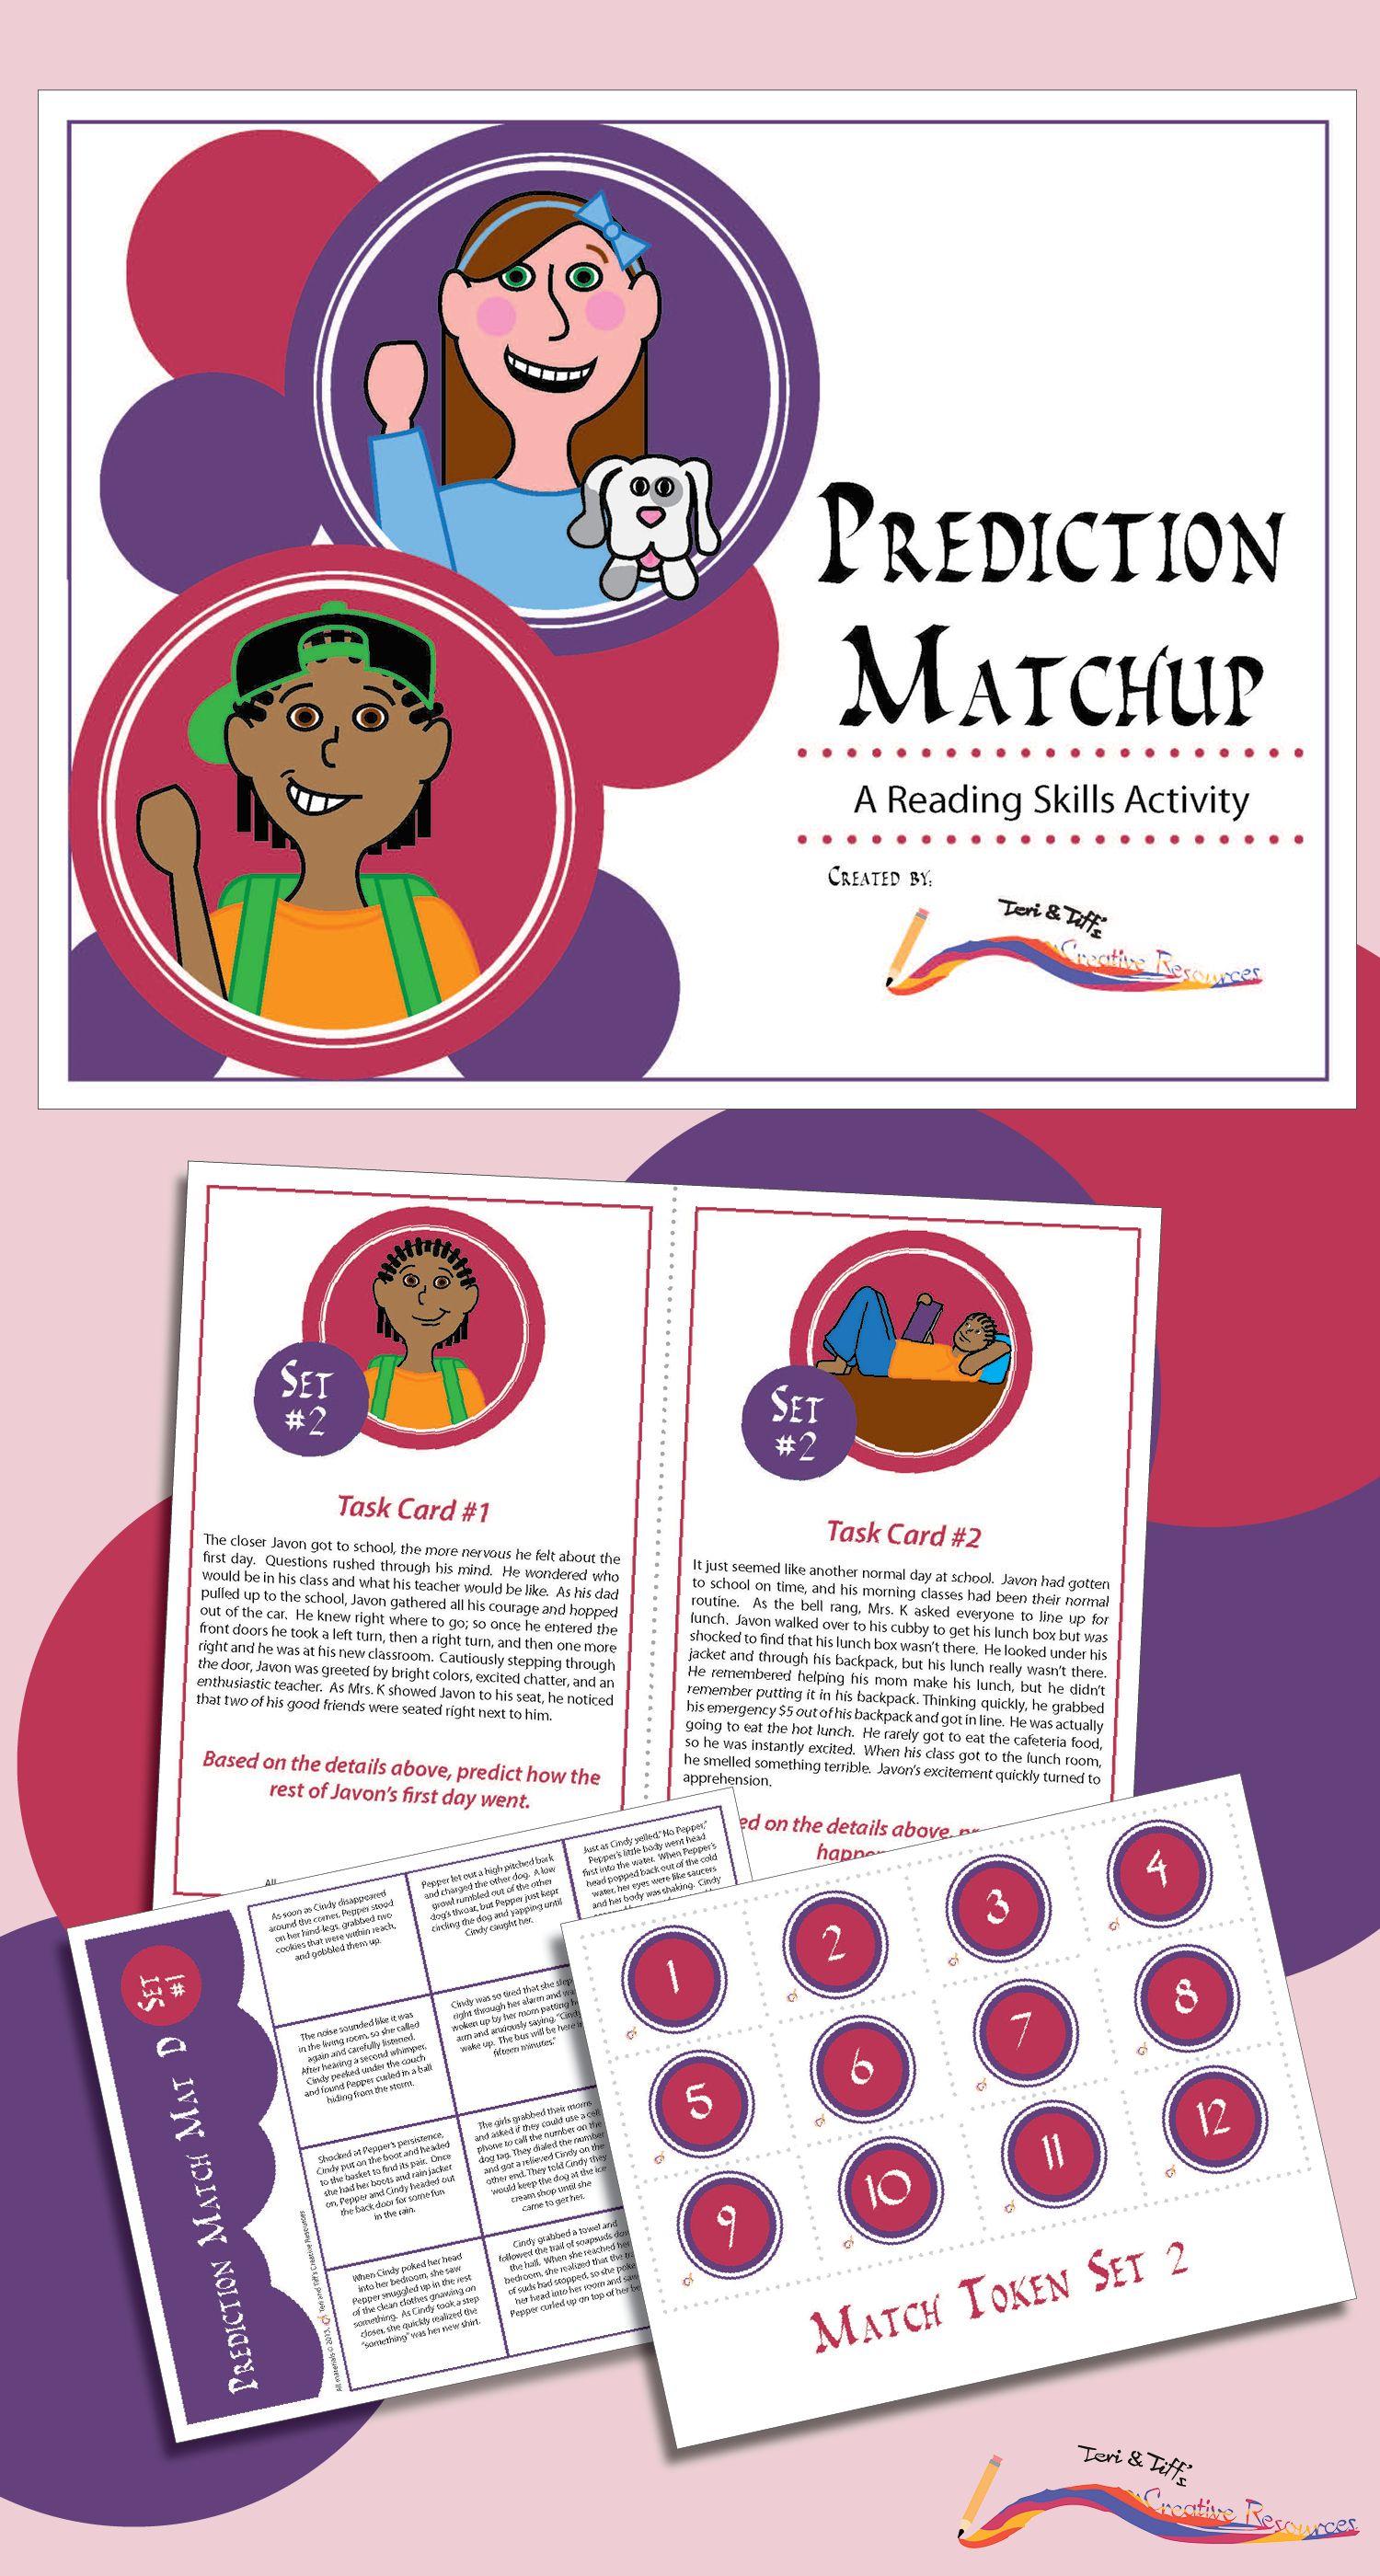 Prediction Matchup A Focused Reading Skills Activity